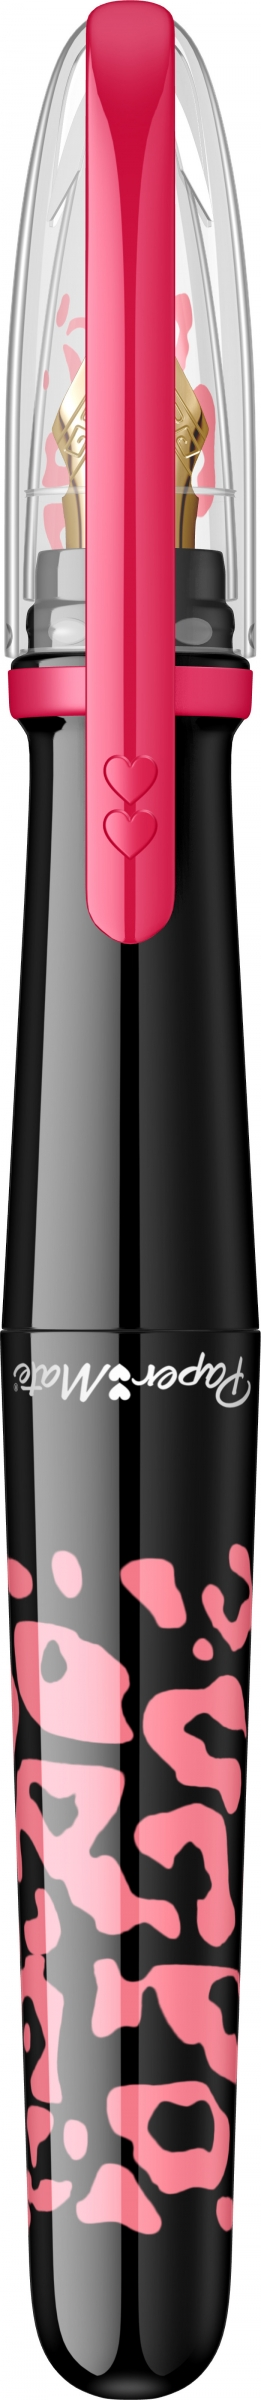 Black Splash-385